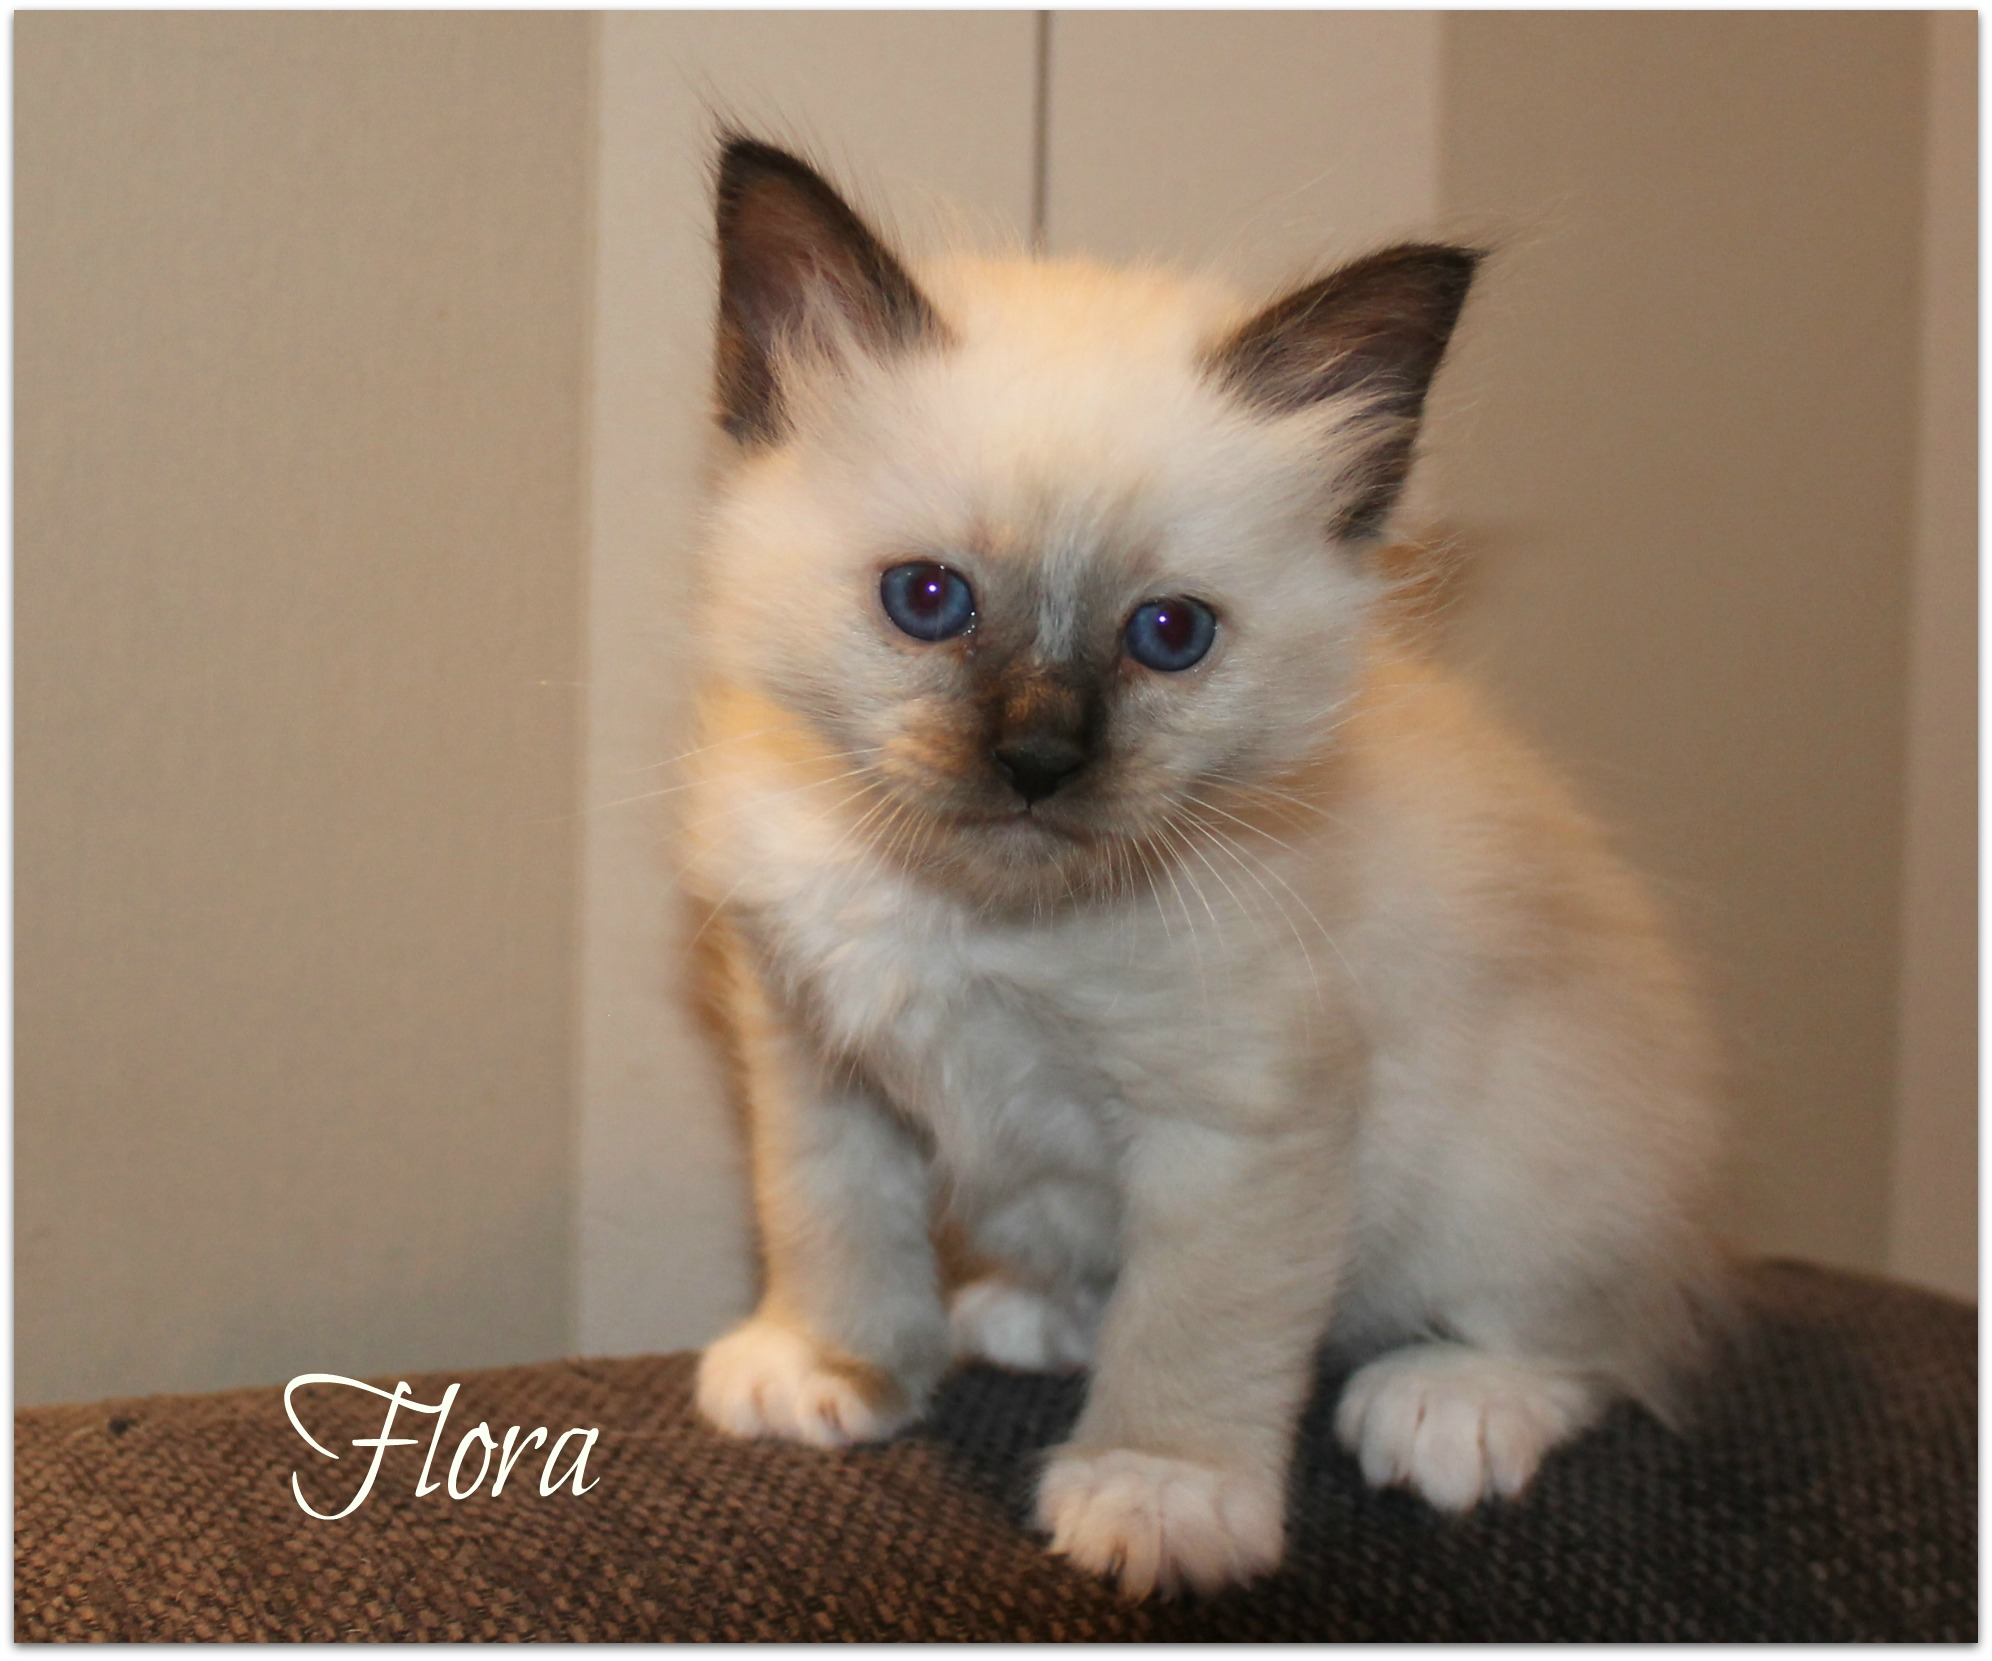 flora_0